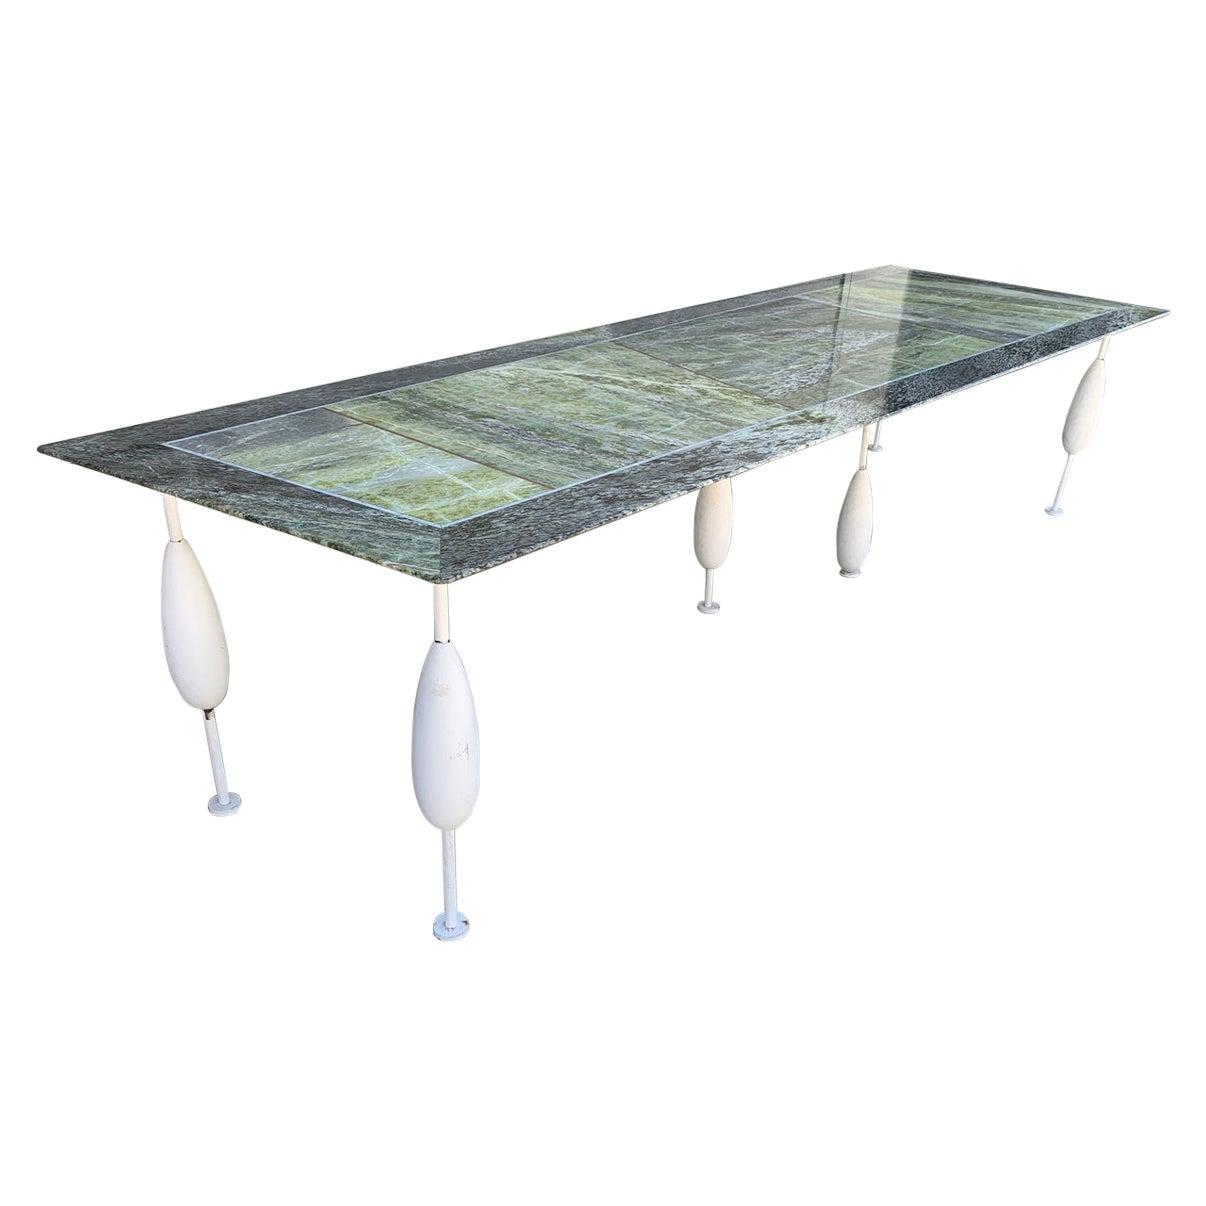 Asymmetrical Marble Table by Sema Topaloglu